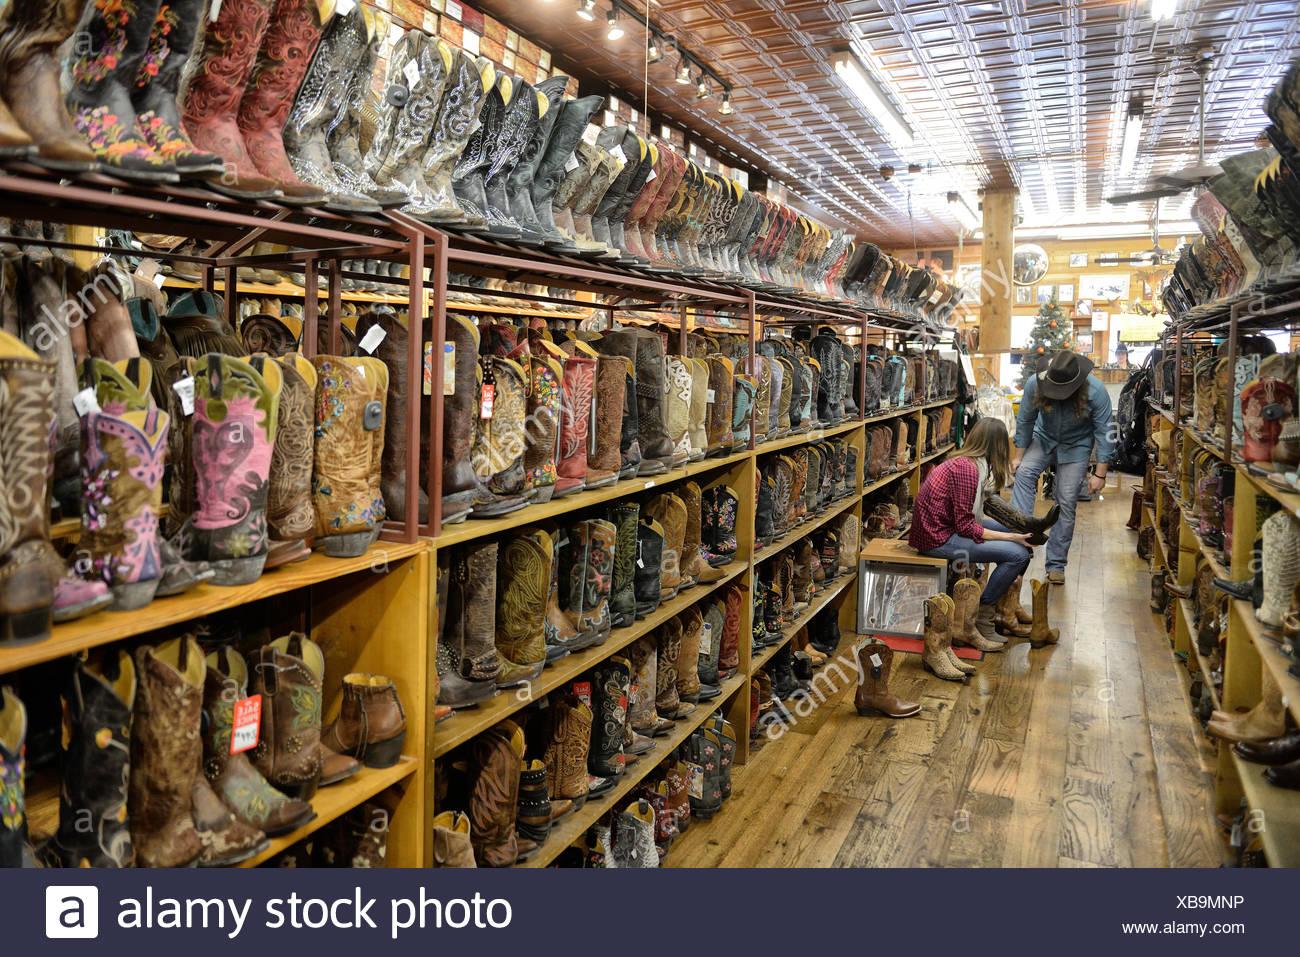 USA, USA, Amerika, Texas, Austin, Boot, Stiefel, Store, Einkaufen, Americana Stockbild